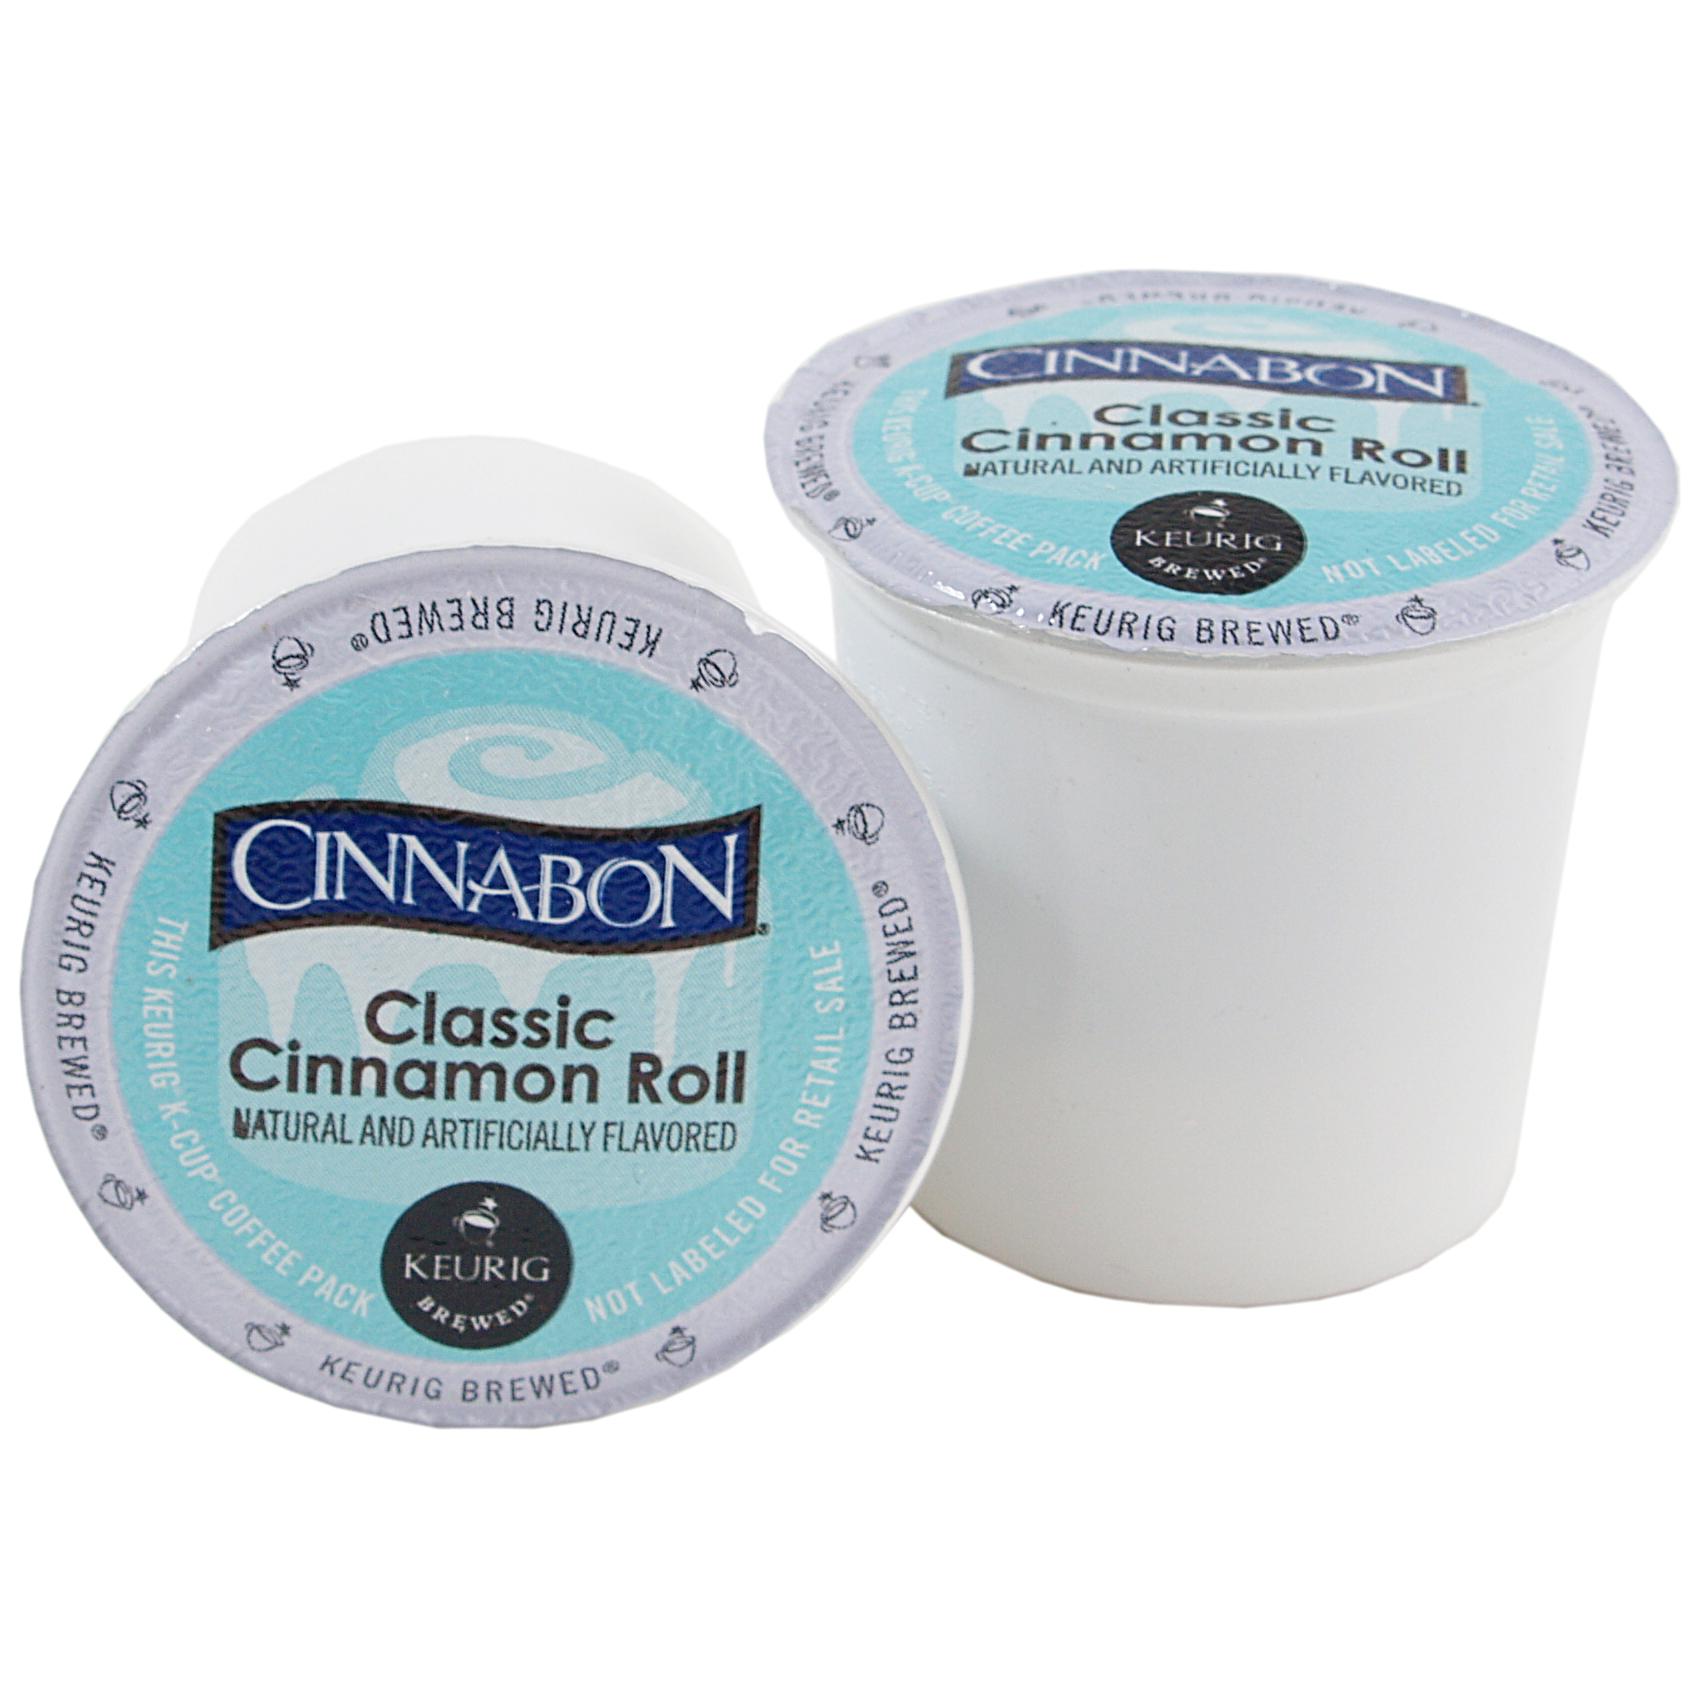 Cinnabon Classic Cinnamon Roll Coffee Keurig K-Cups, 18 Count